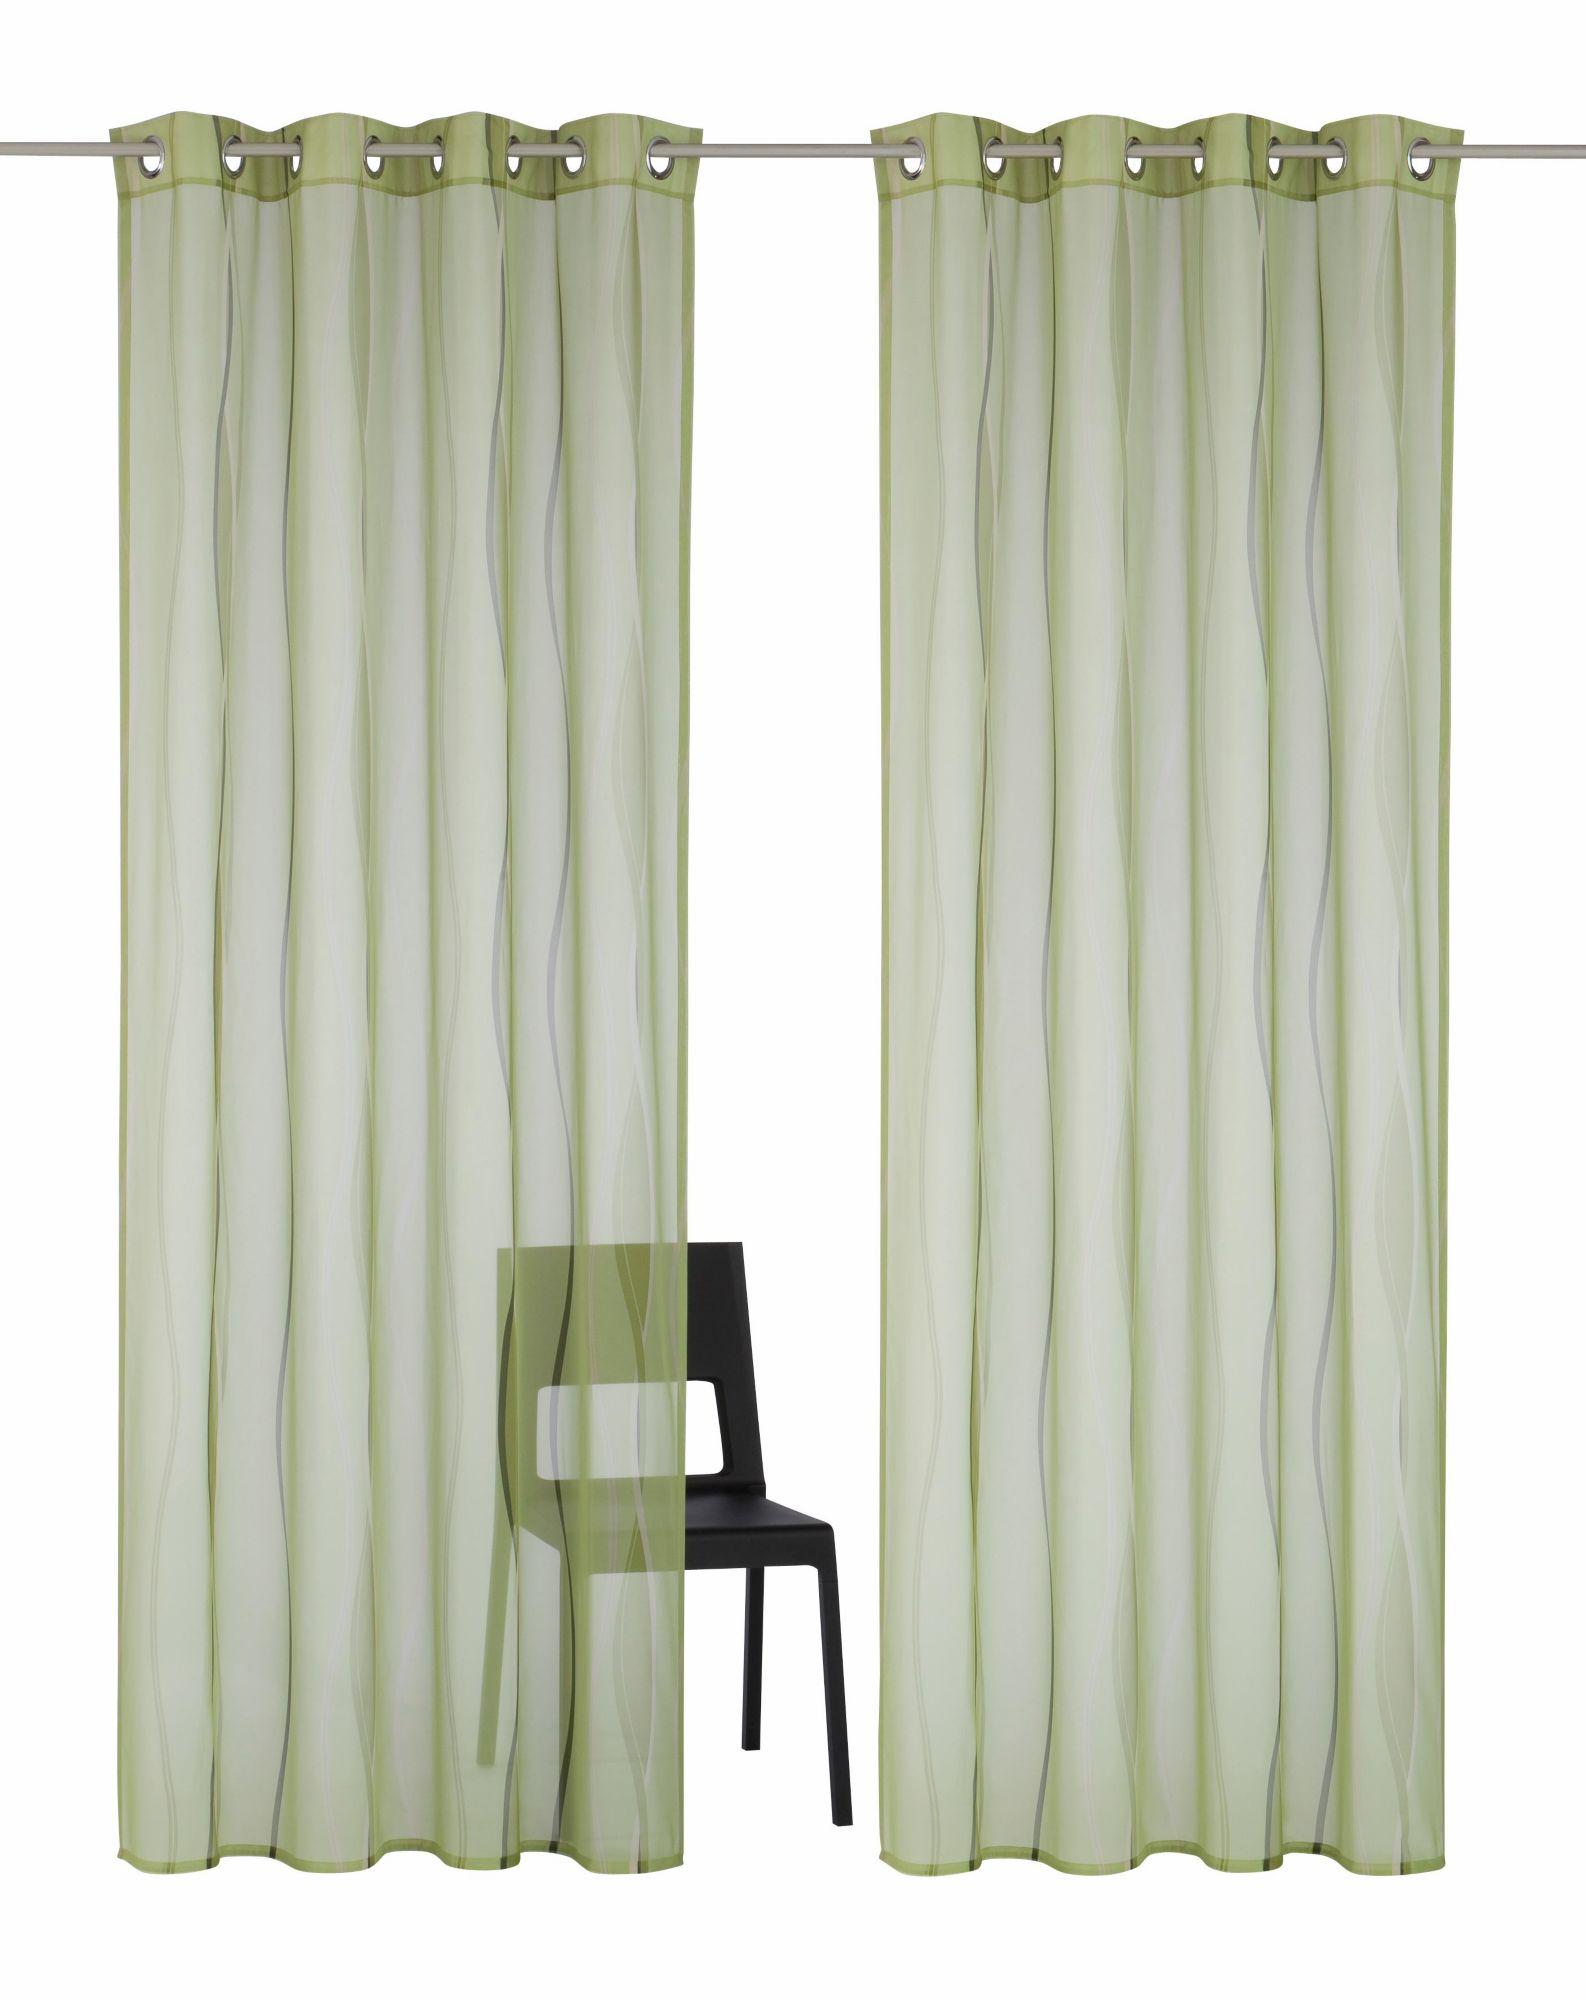 gardine my home dimona 2 st ck schwab versand gardinen vorh nge. Black Bedroom Furniture Sets. Home Design Ideas